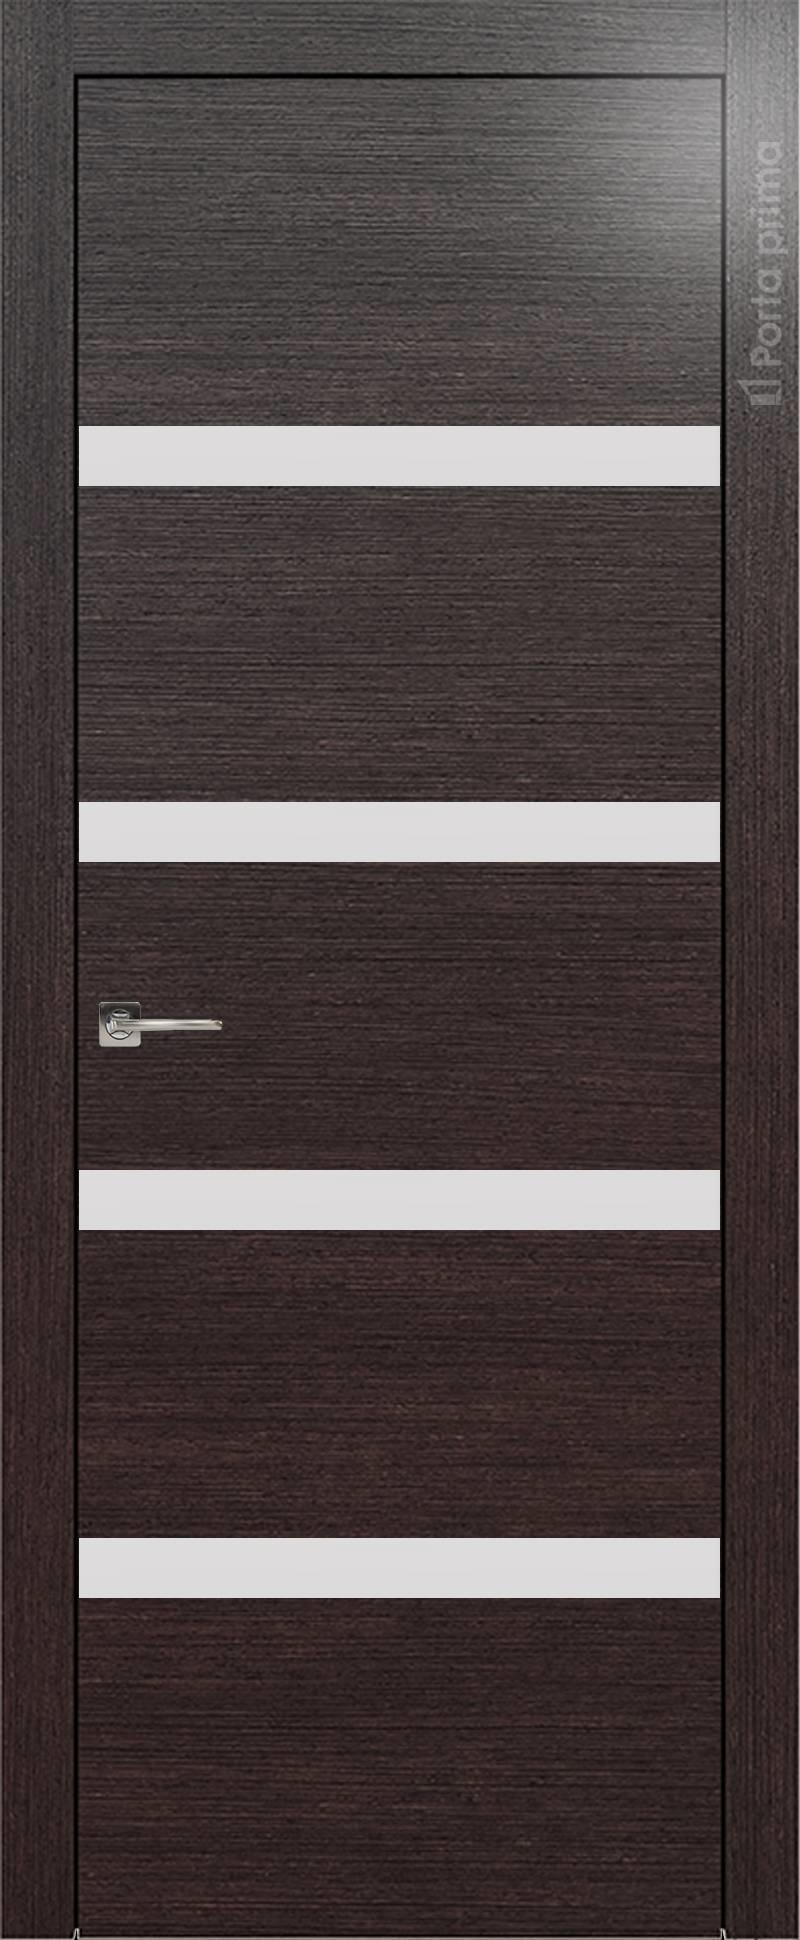 Tivoli Д-4 цвет - Венге Шоколад Без стекла (ДГ)